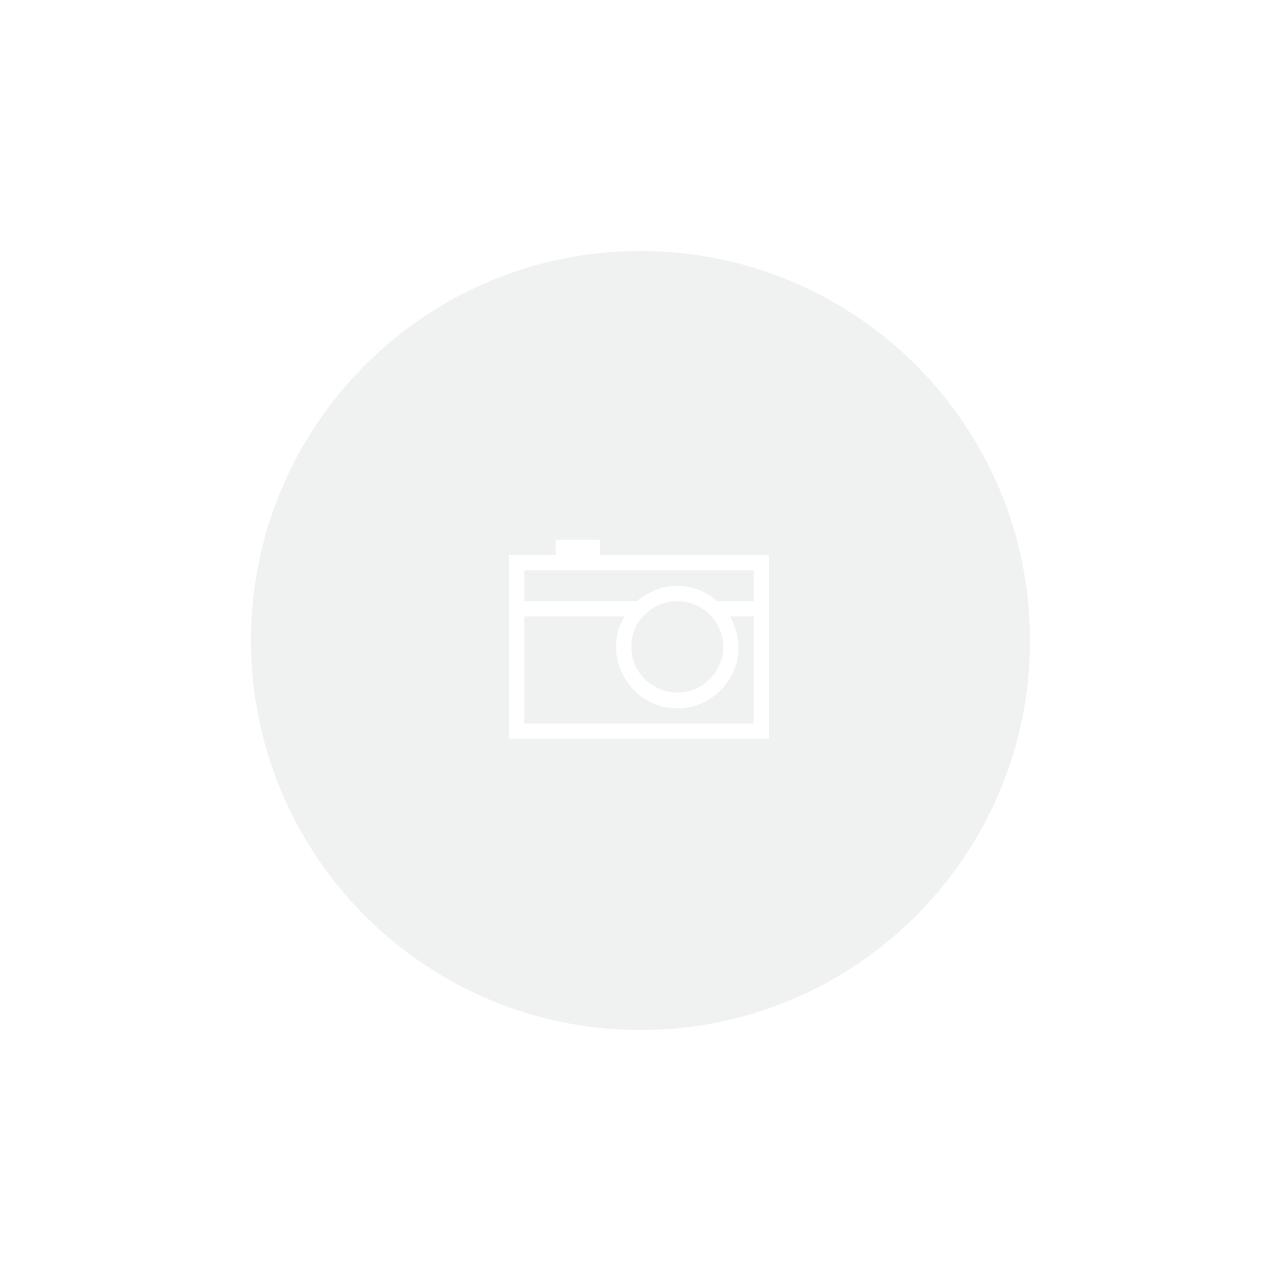 Headset G-fire, com Microfone e Controle de Volume, EPH222, P2